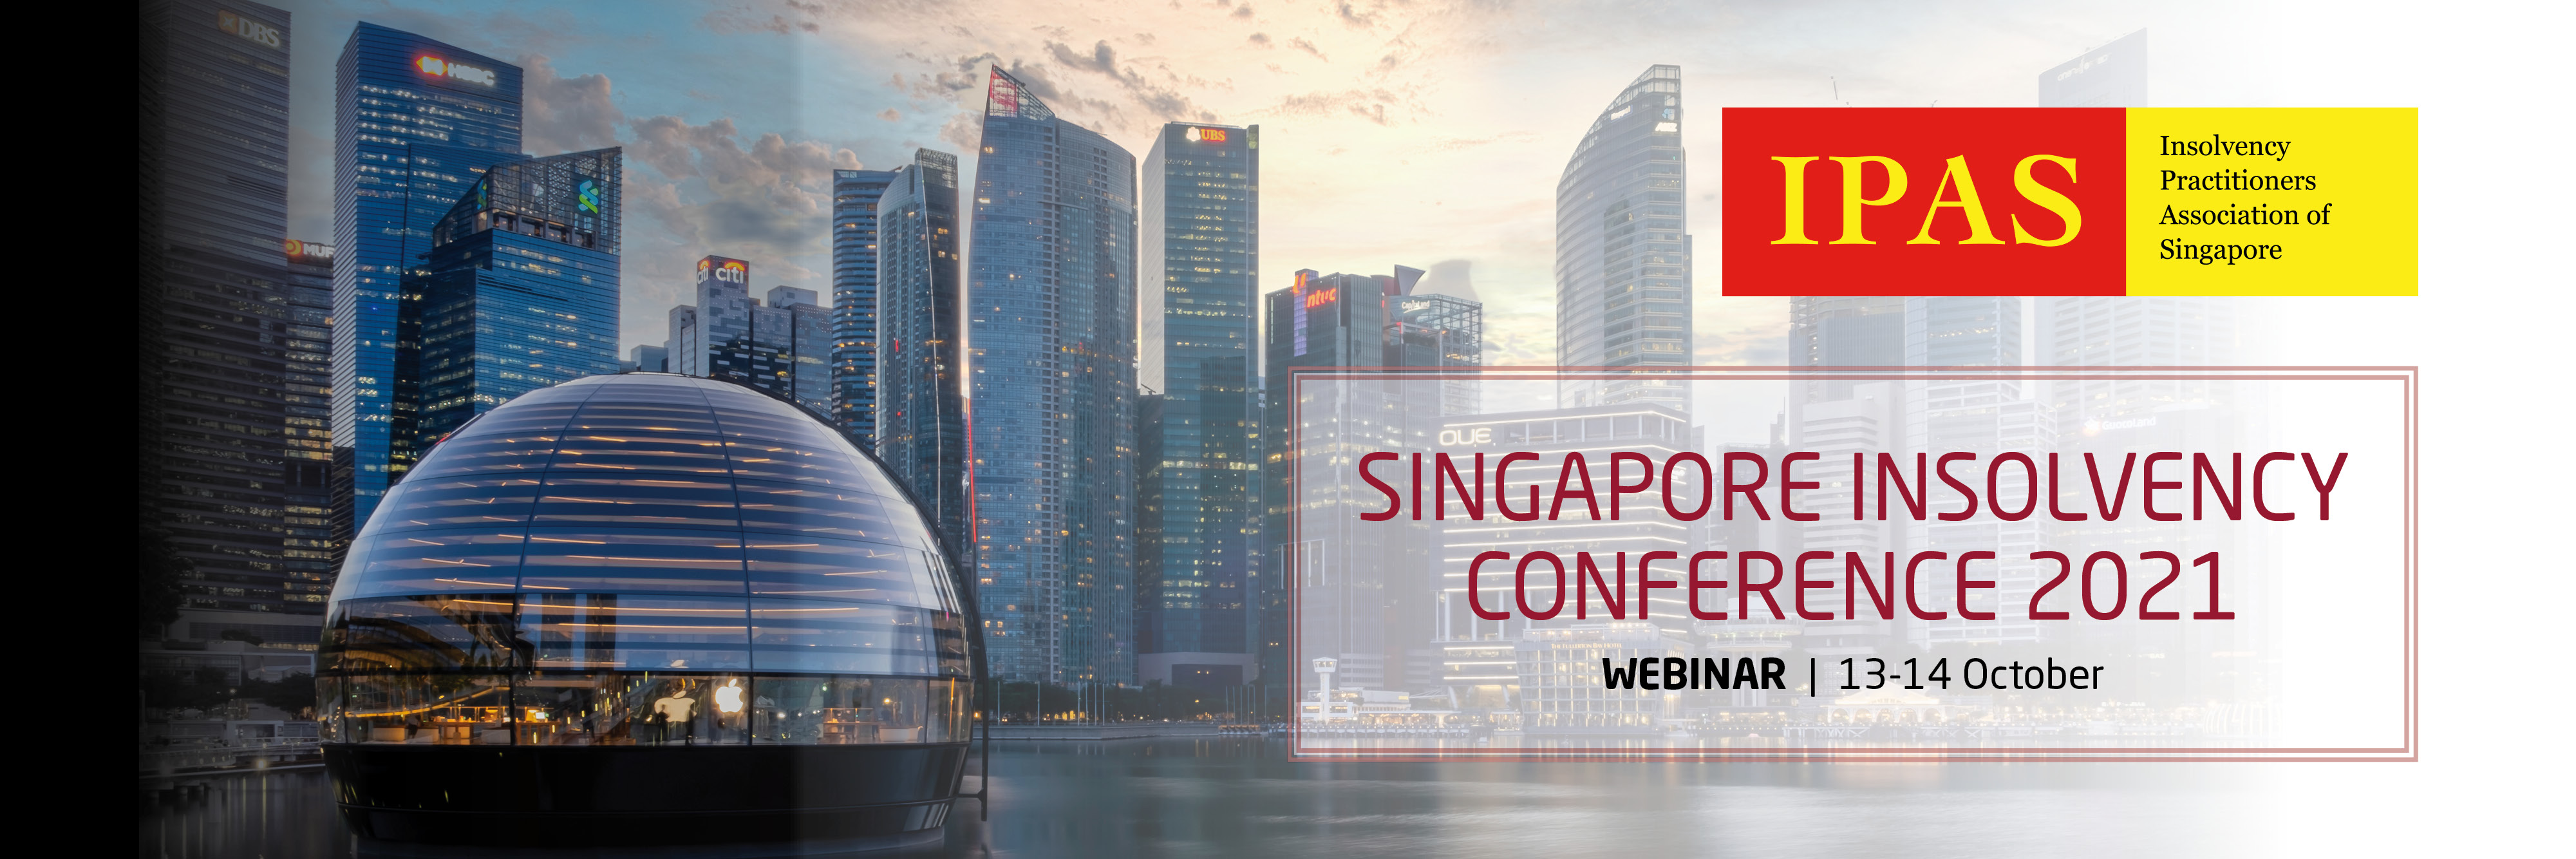 [Webinar] Singapore Insolvency Conference 2021 Banner Image